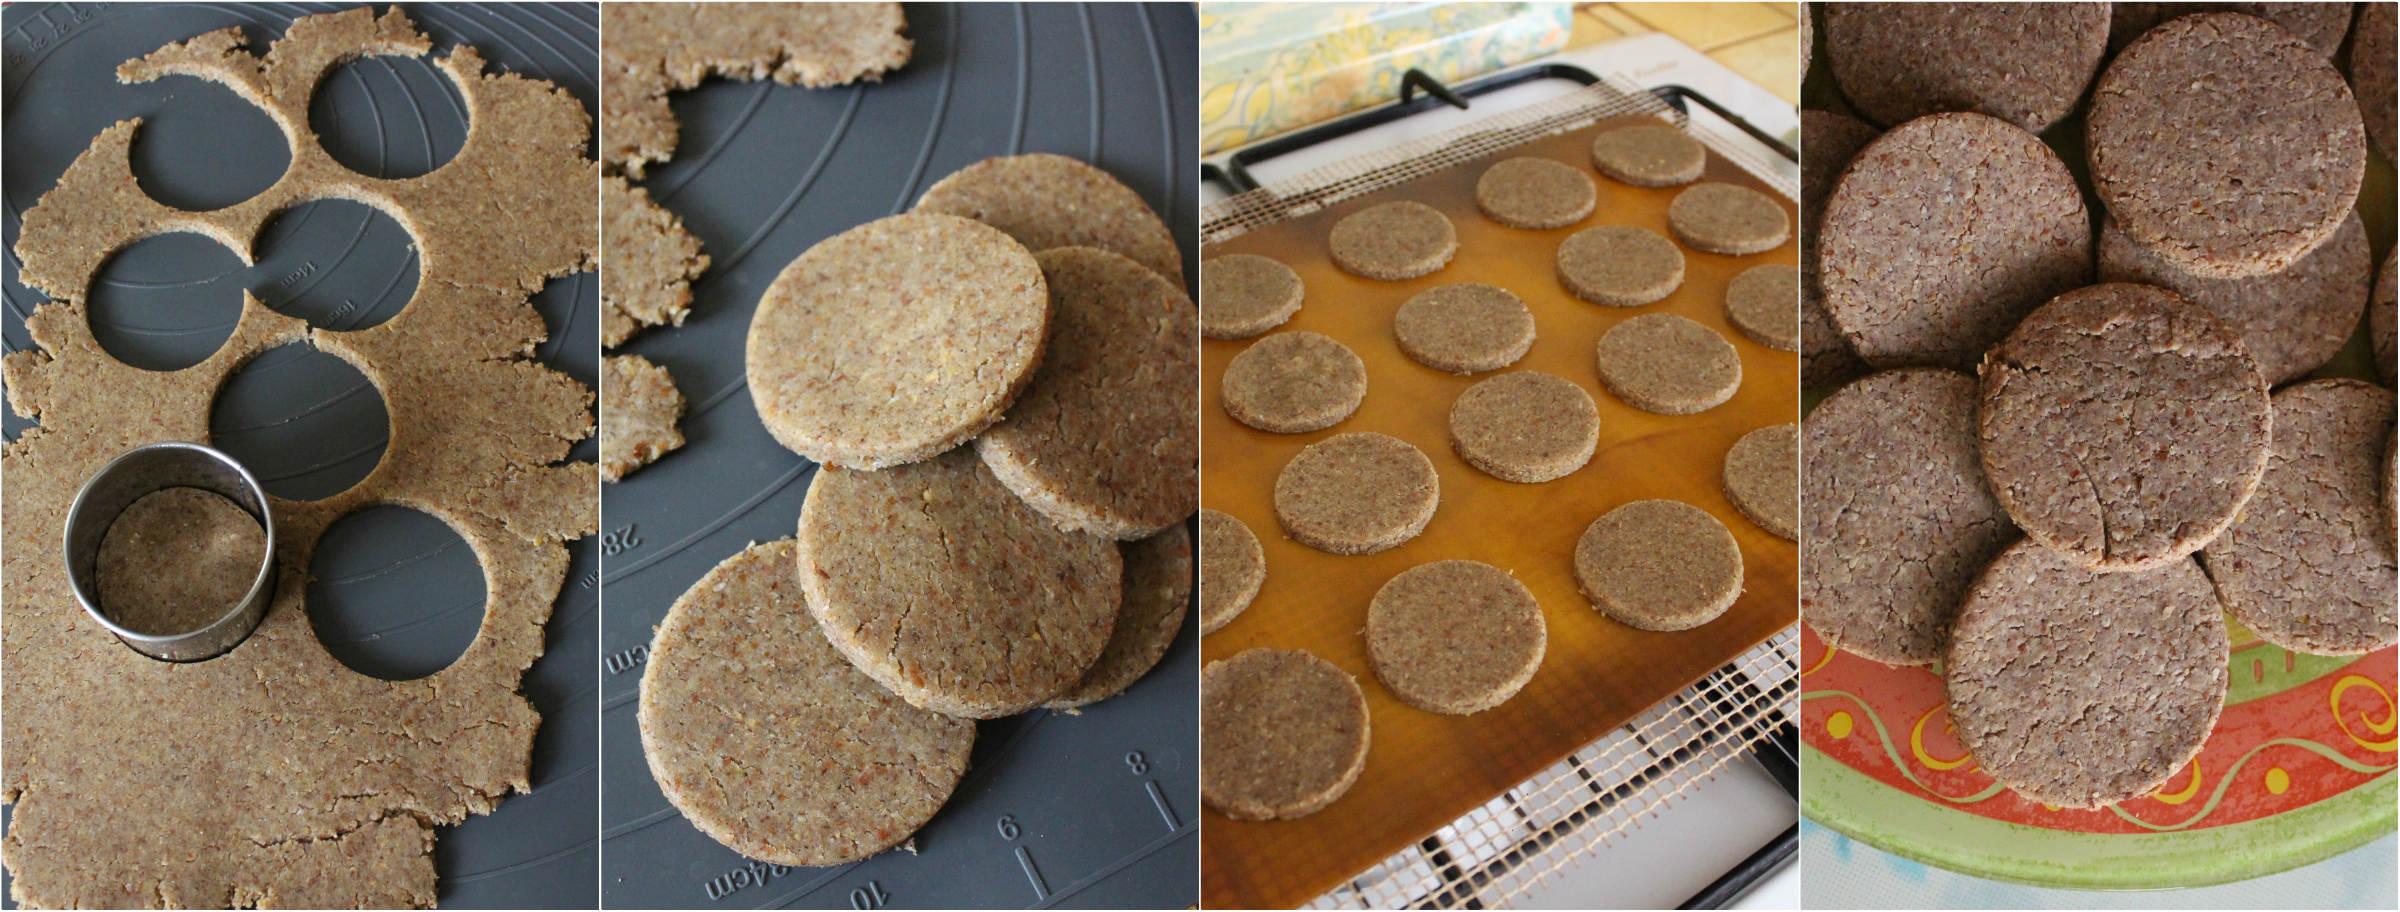 Crackers Collage prep